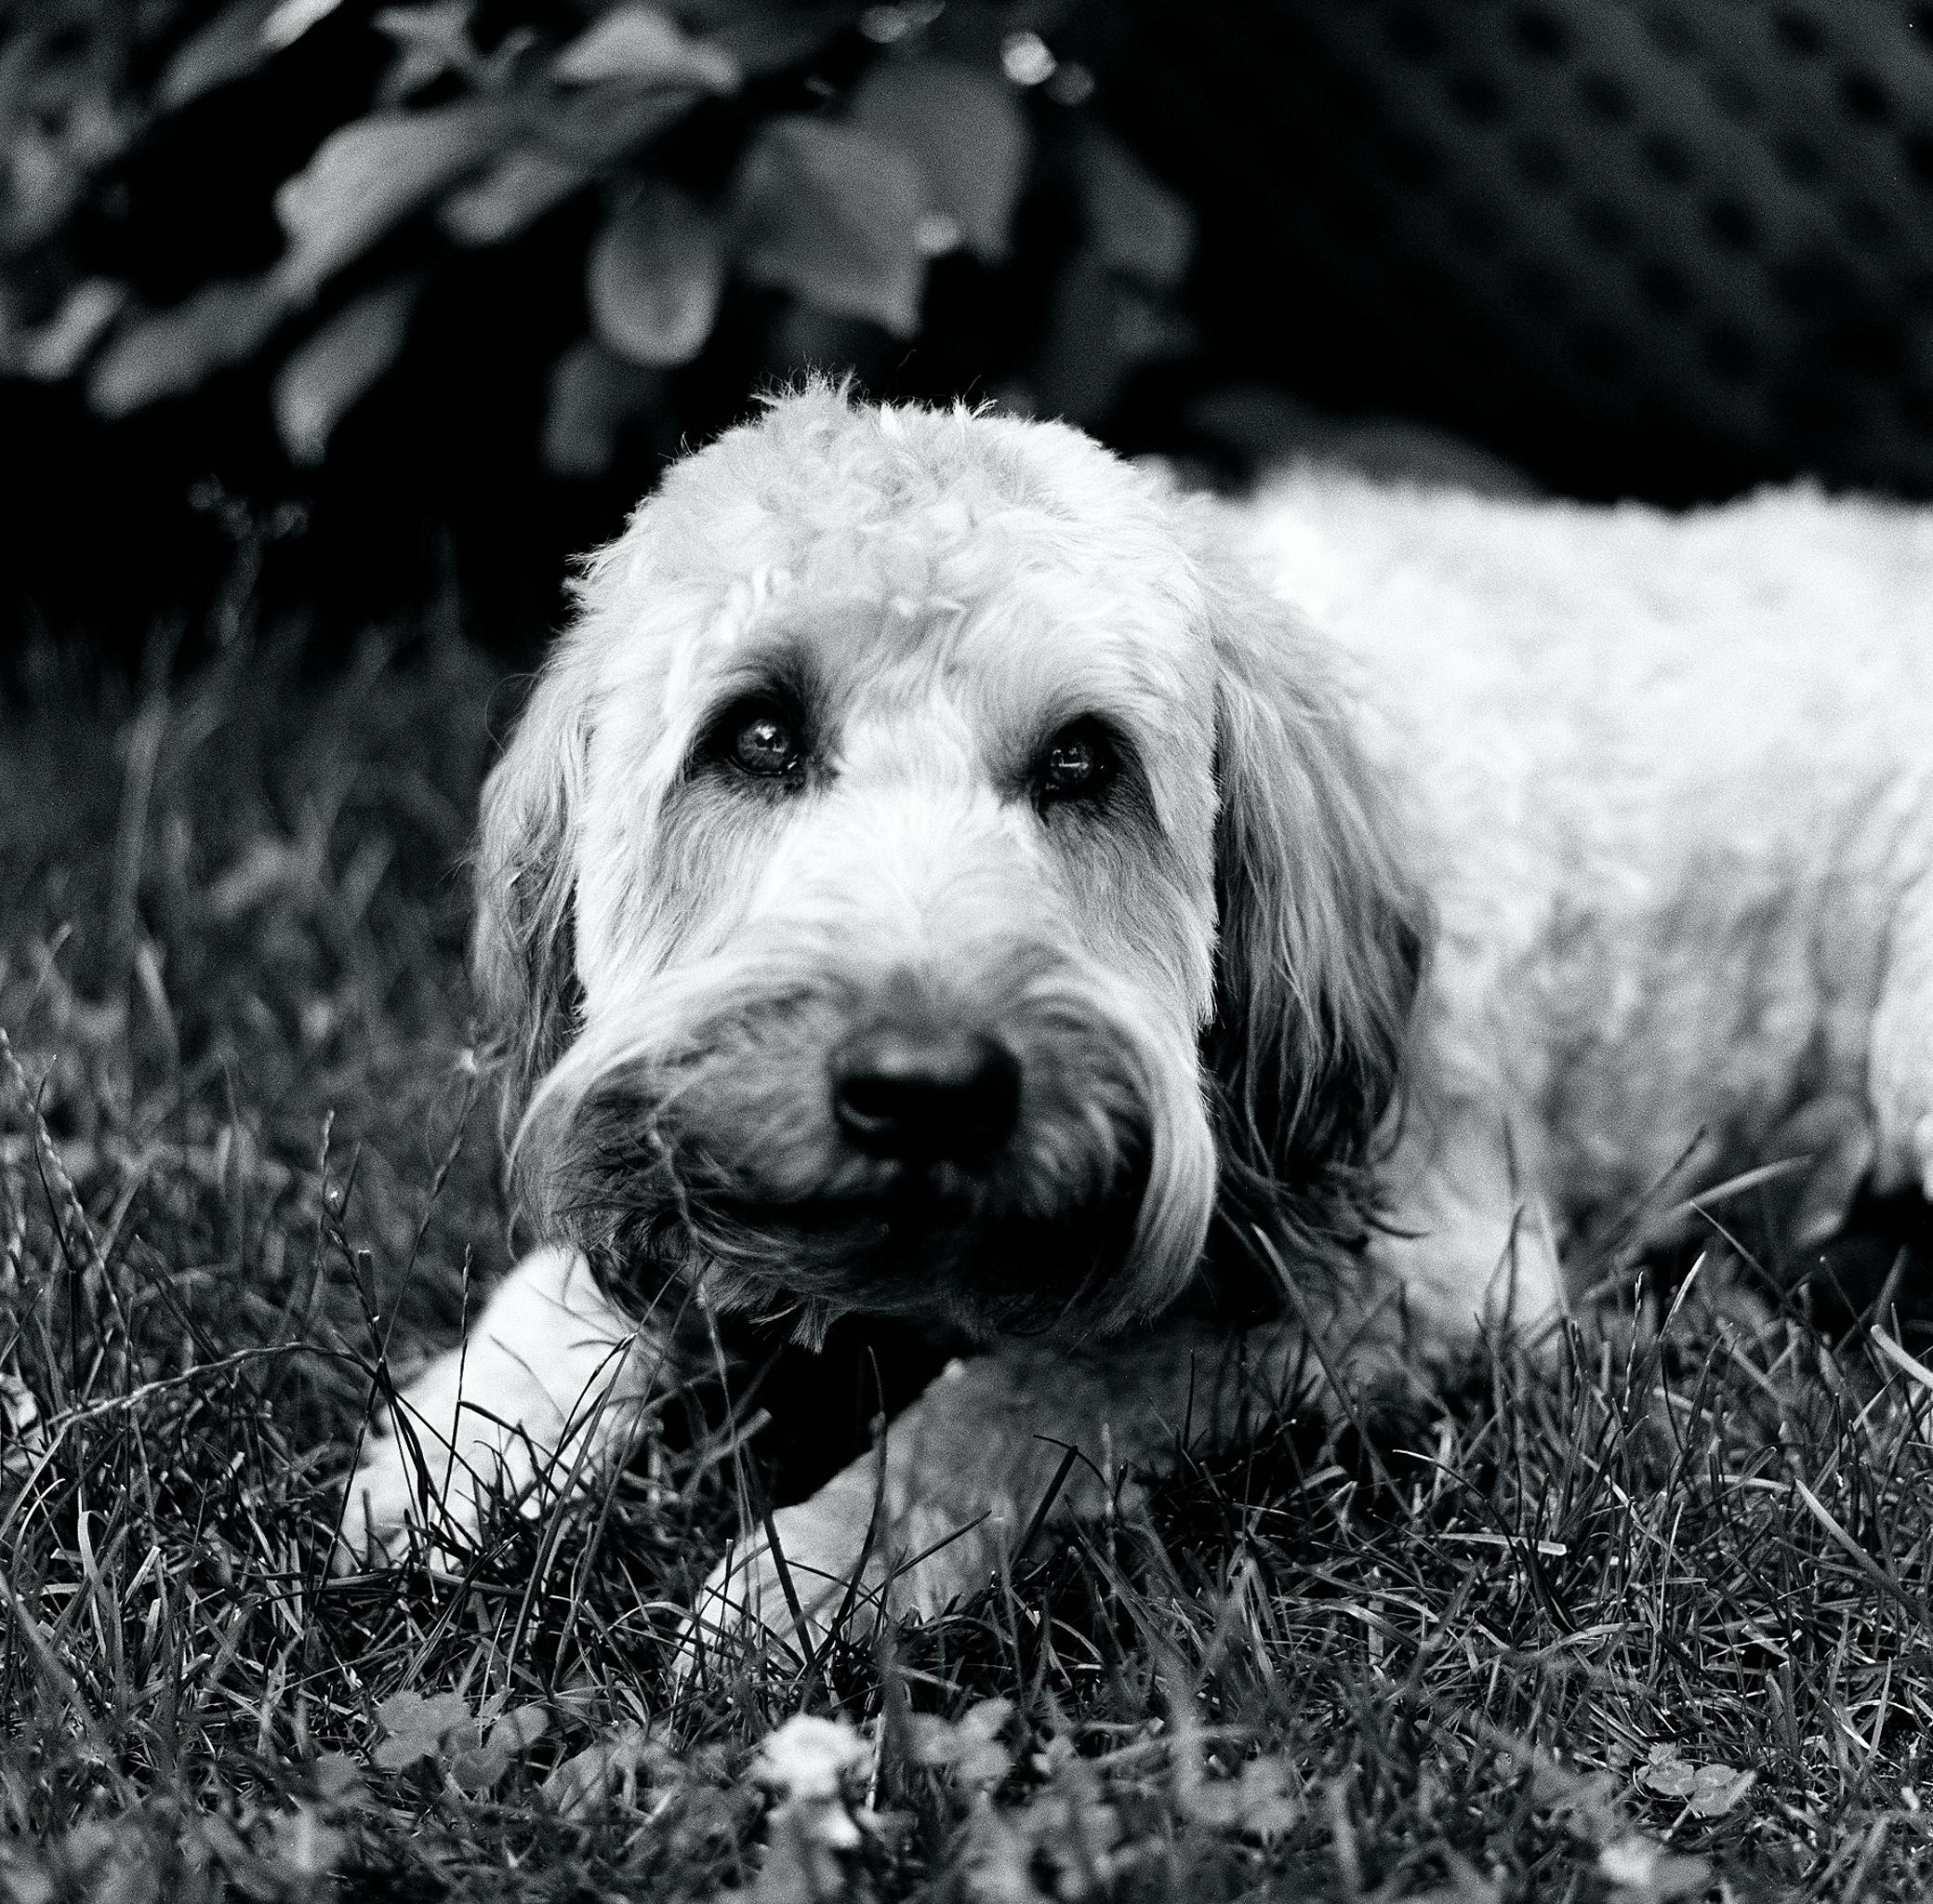 lauren-ashmore-oscar-dog-cute-small-terrior-grass-bw-black-white-120-kodak-medium-format